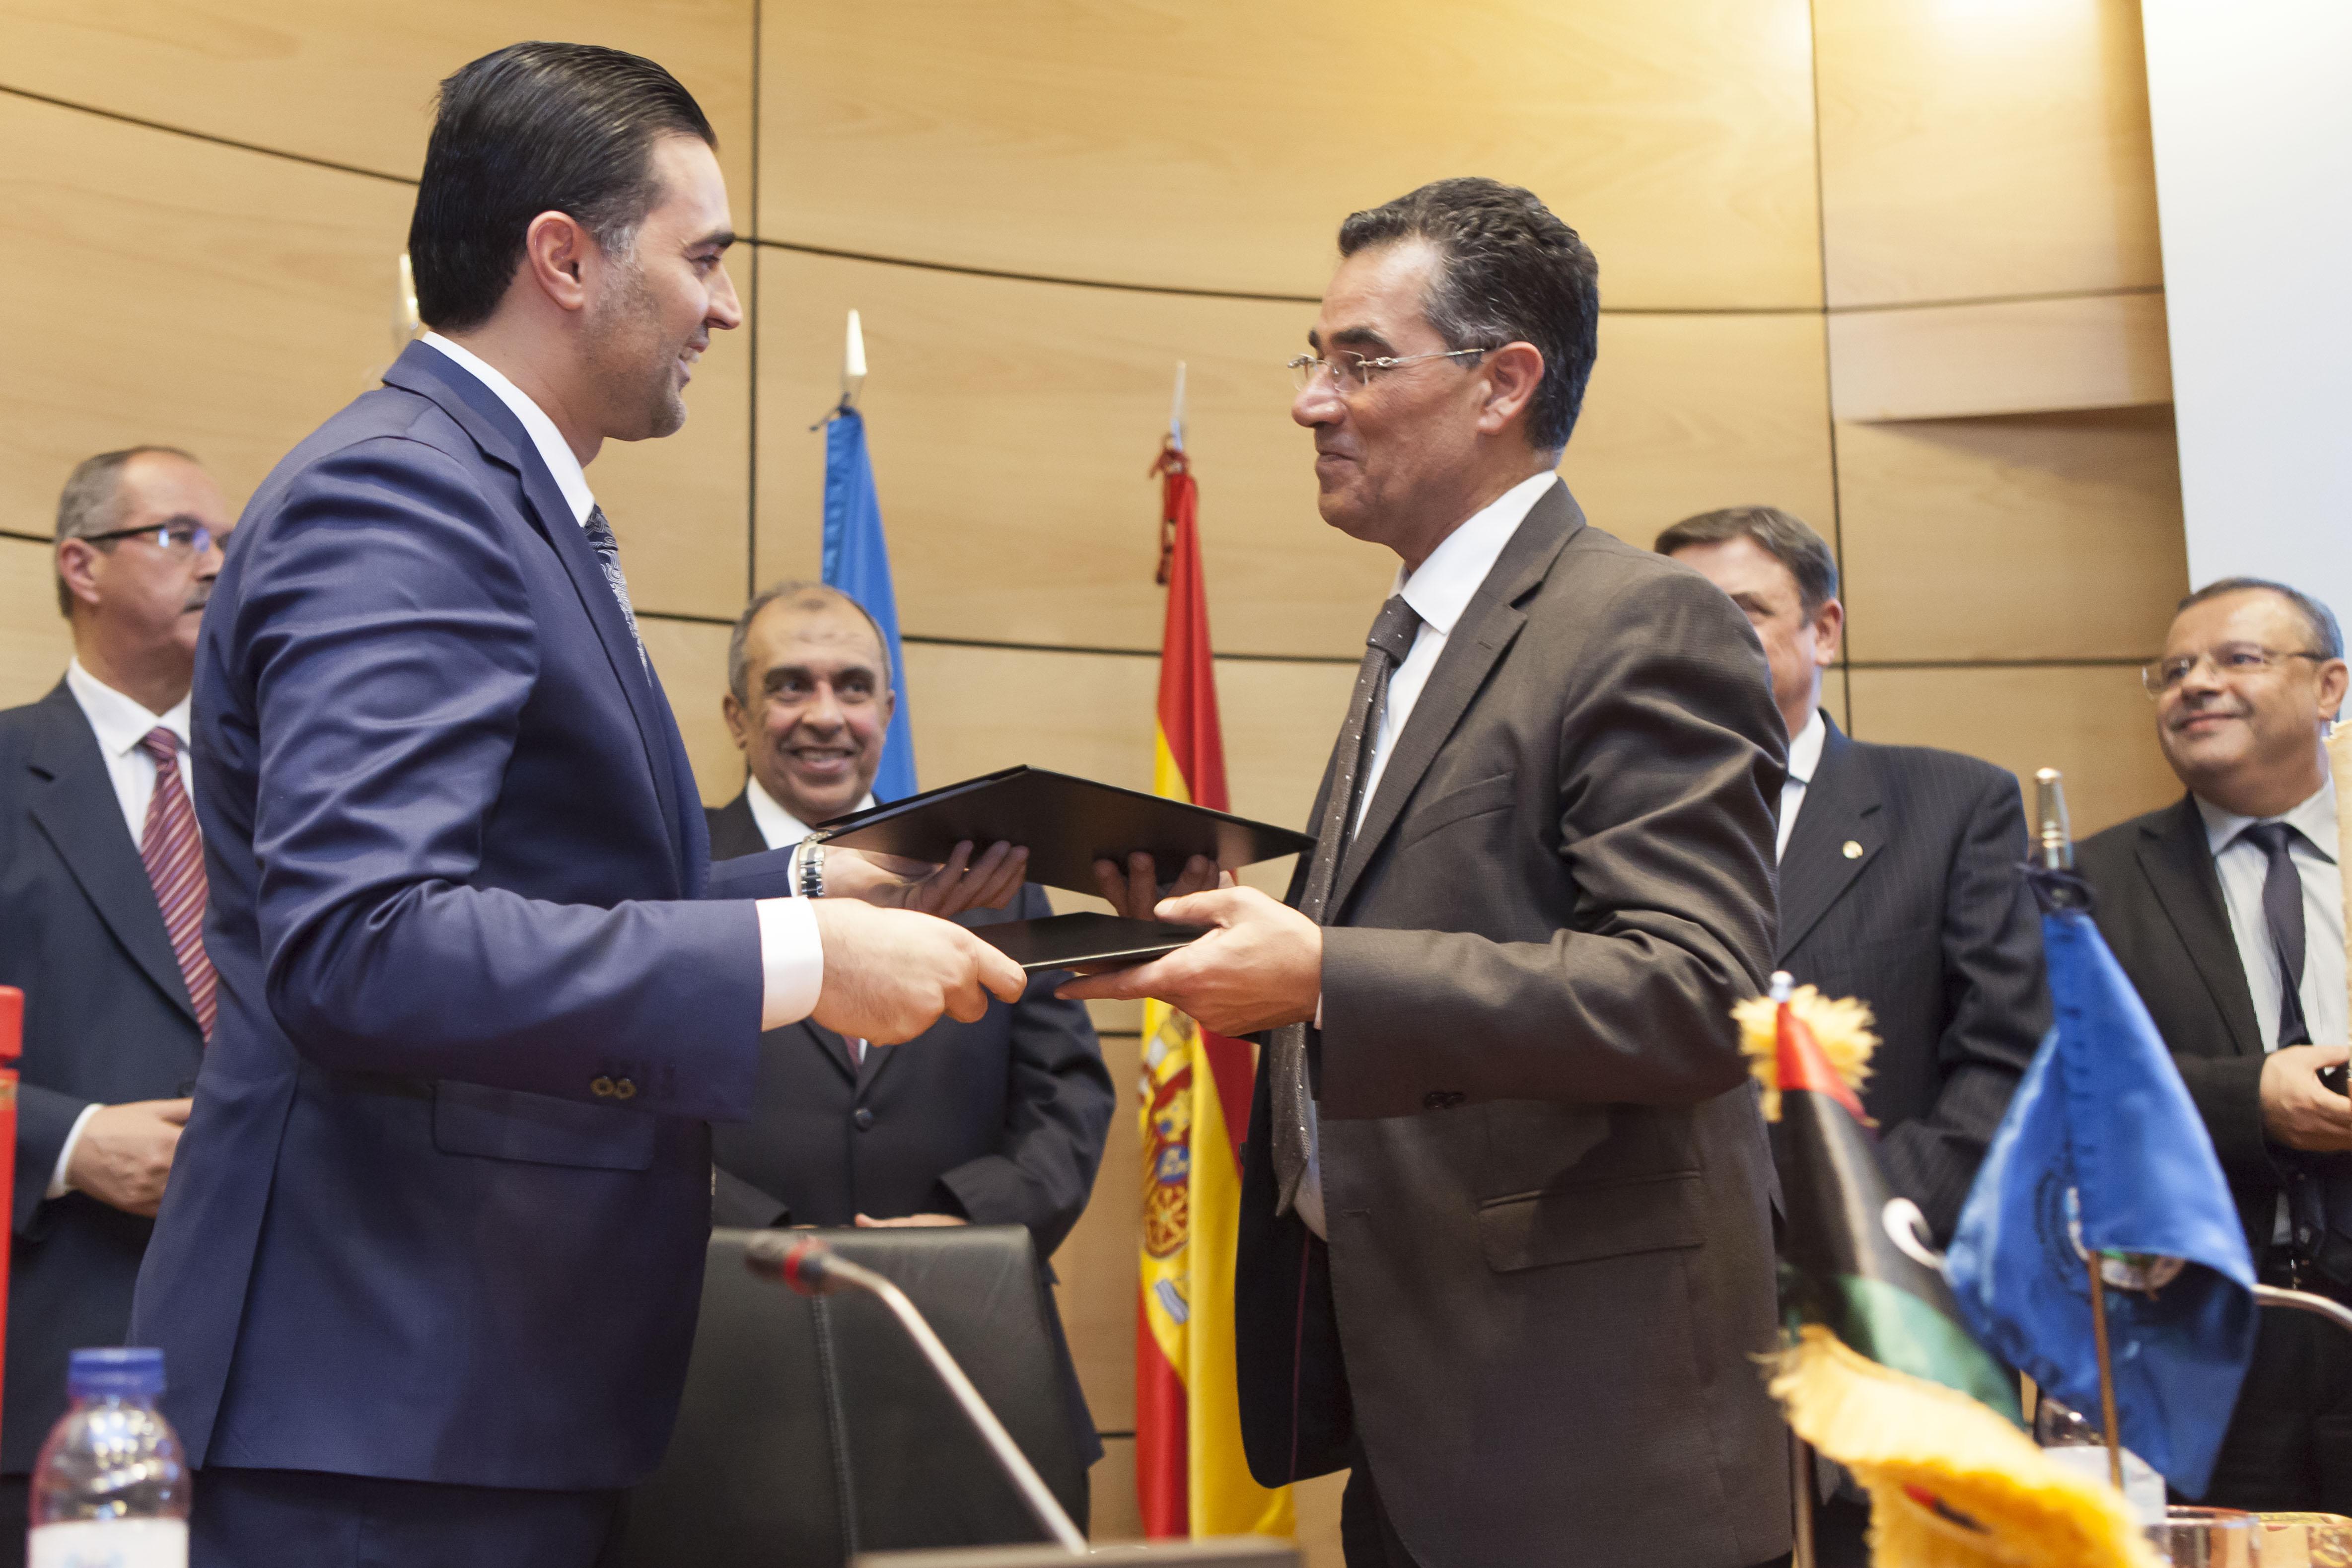 accordo COI e Libia